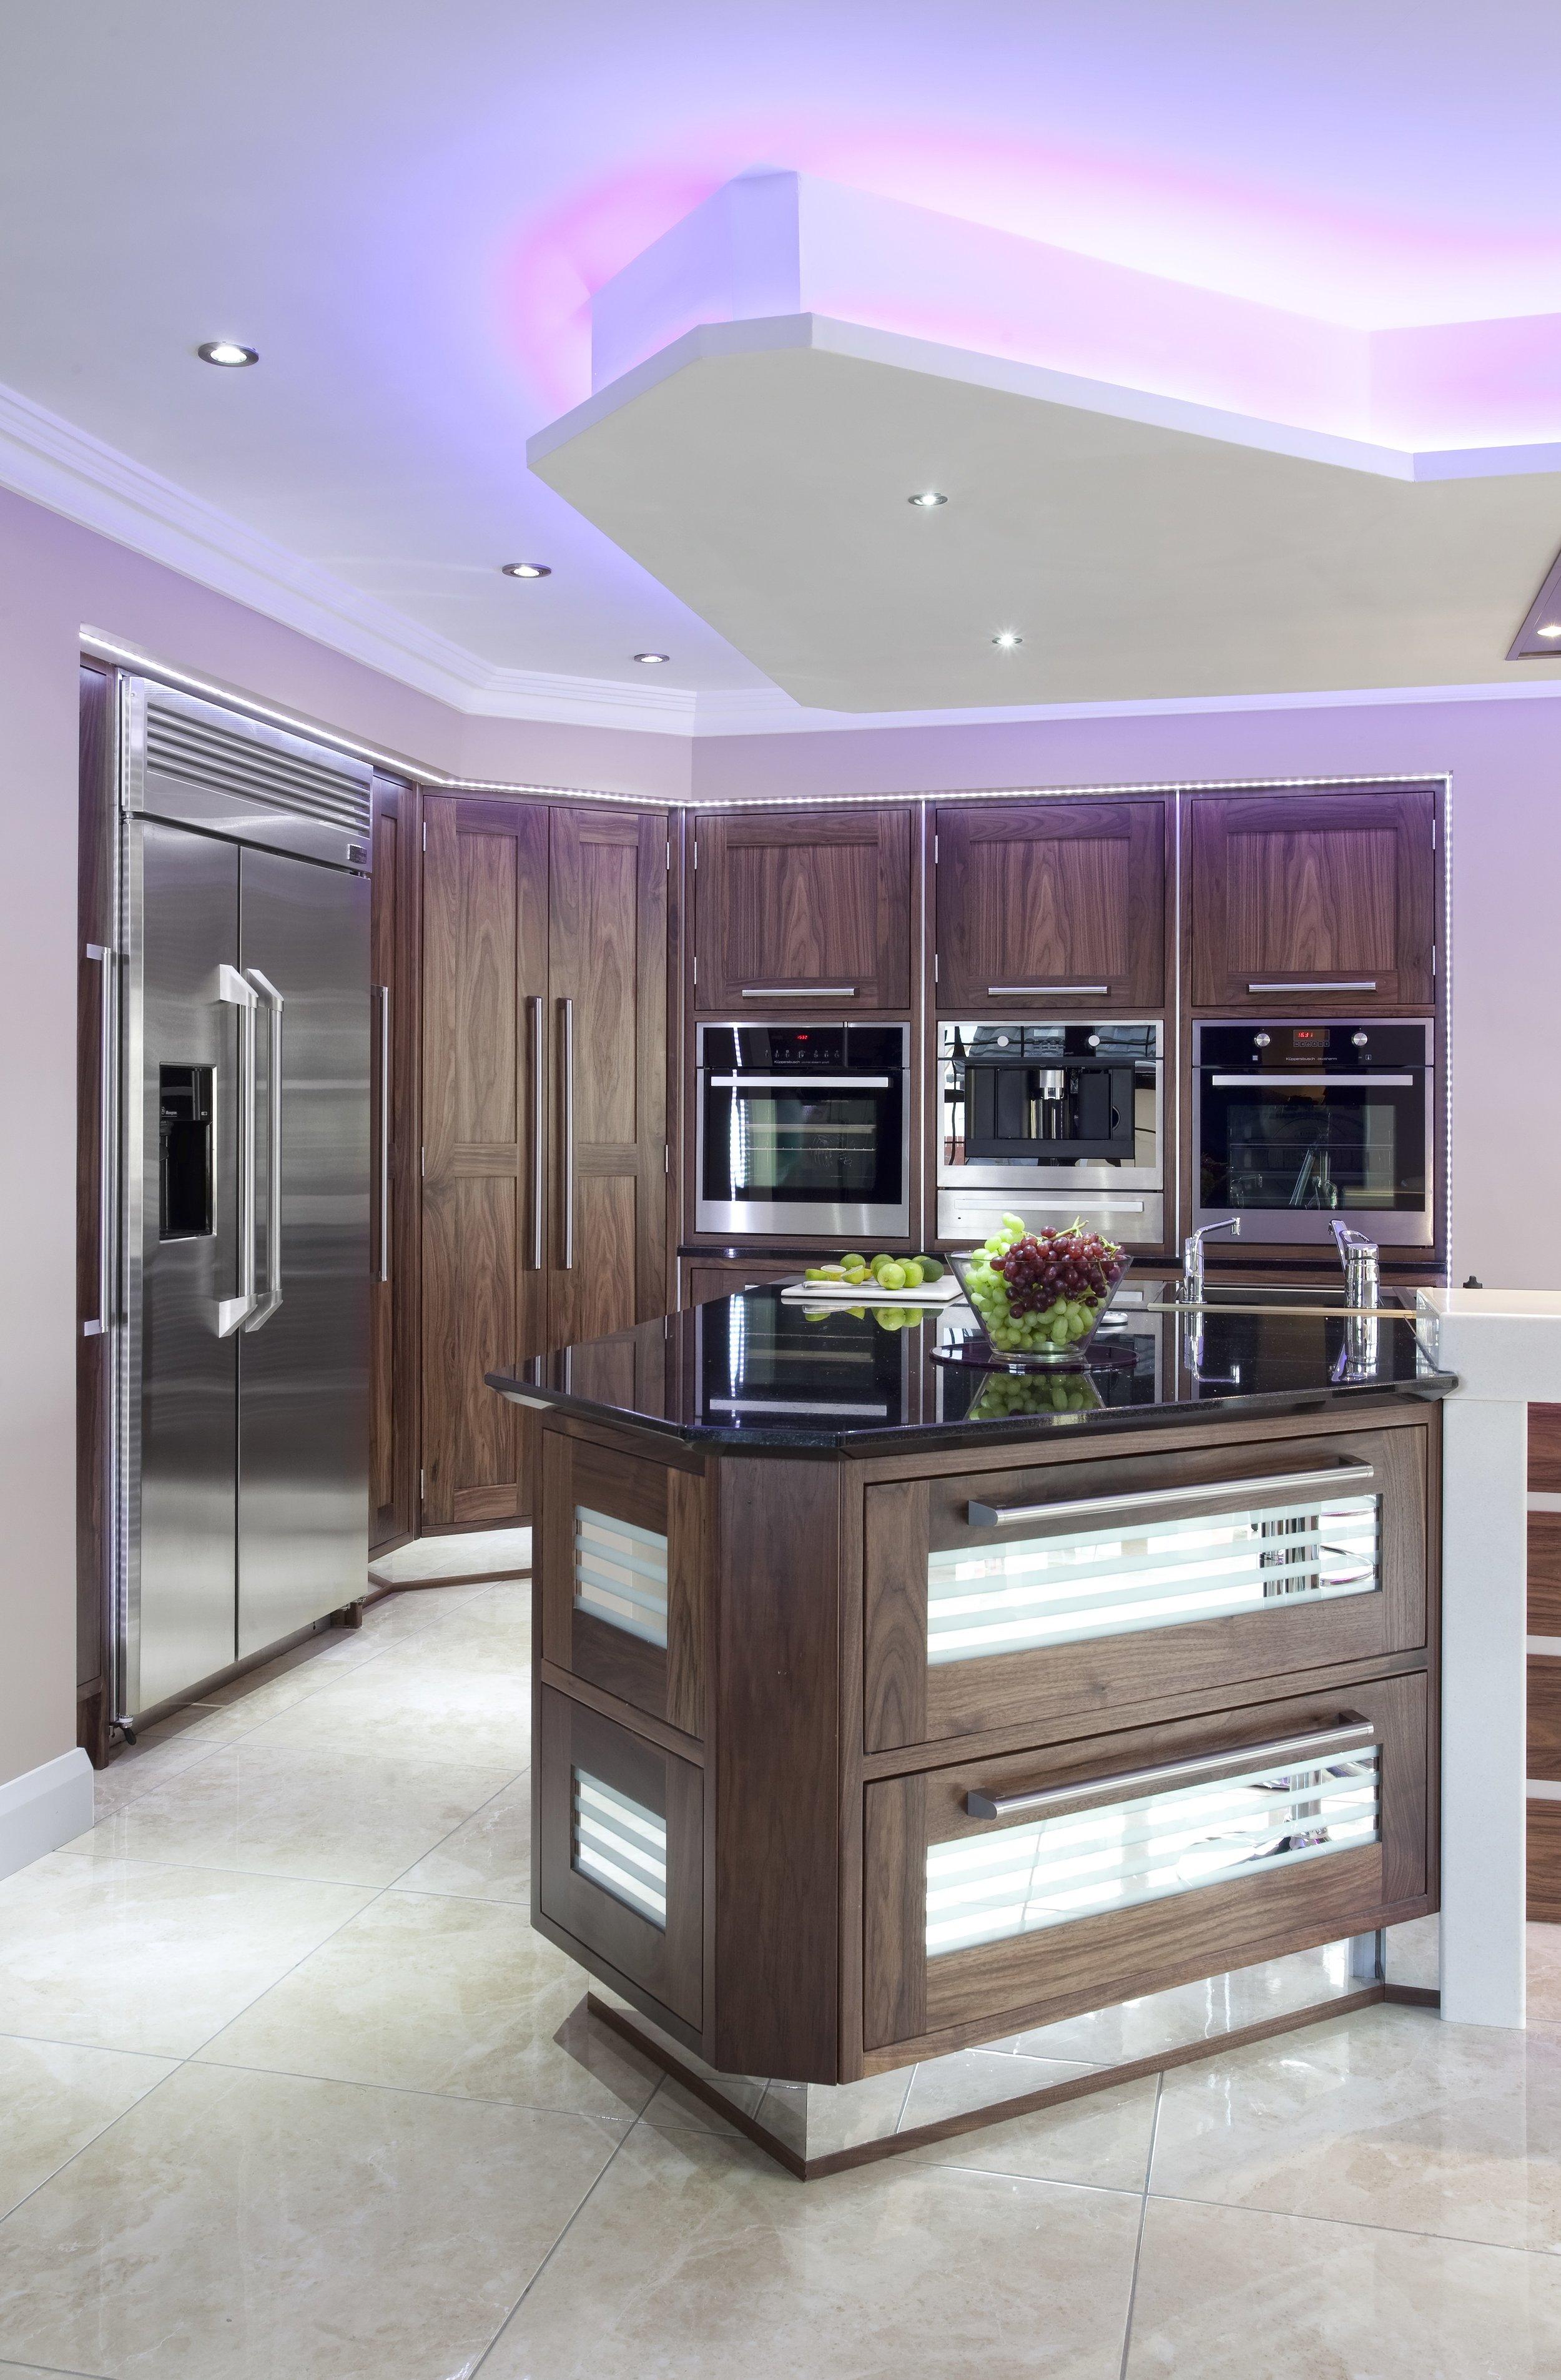 SH -003 -Walnut kitchen.jpg